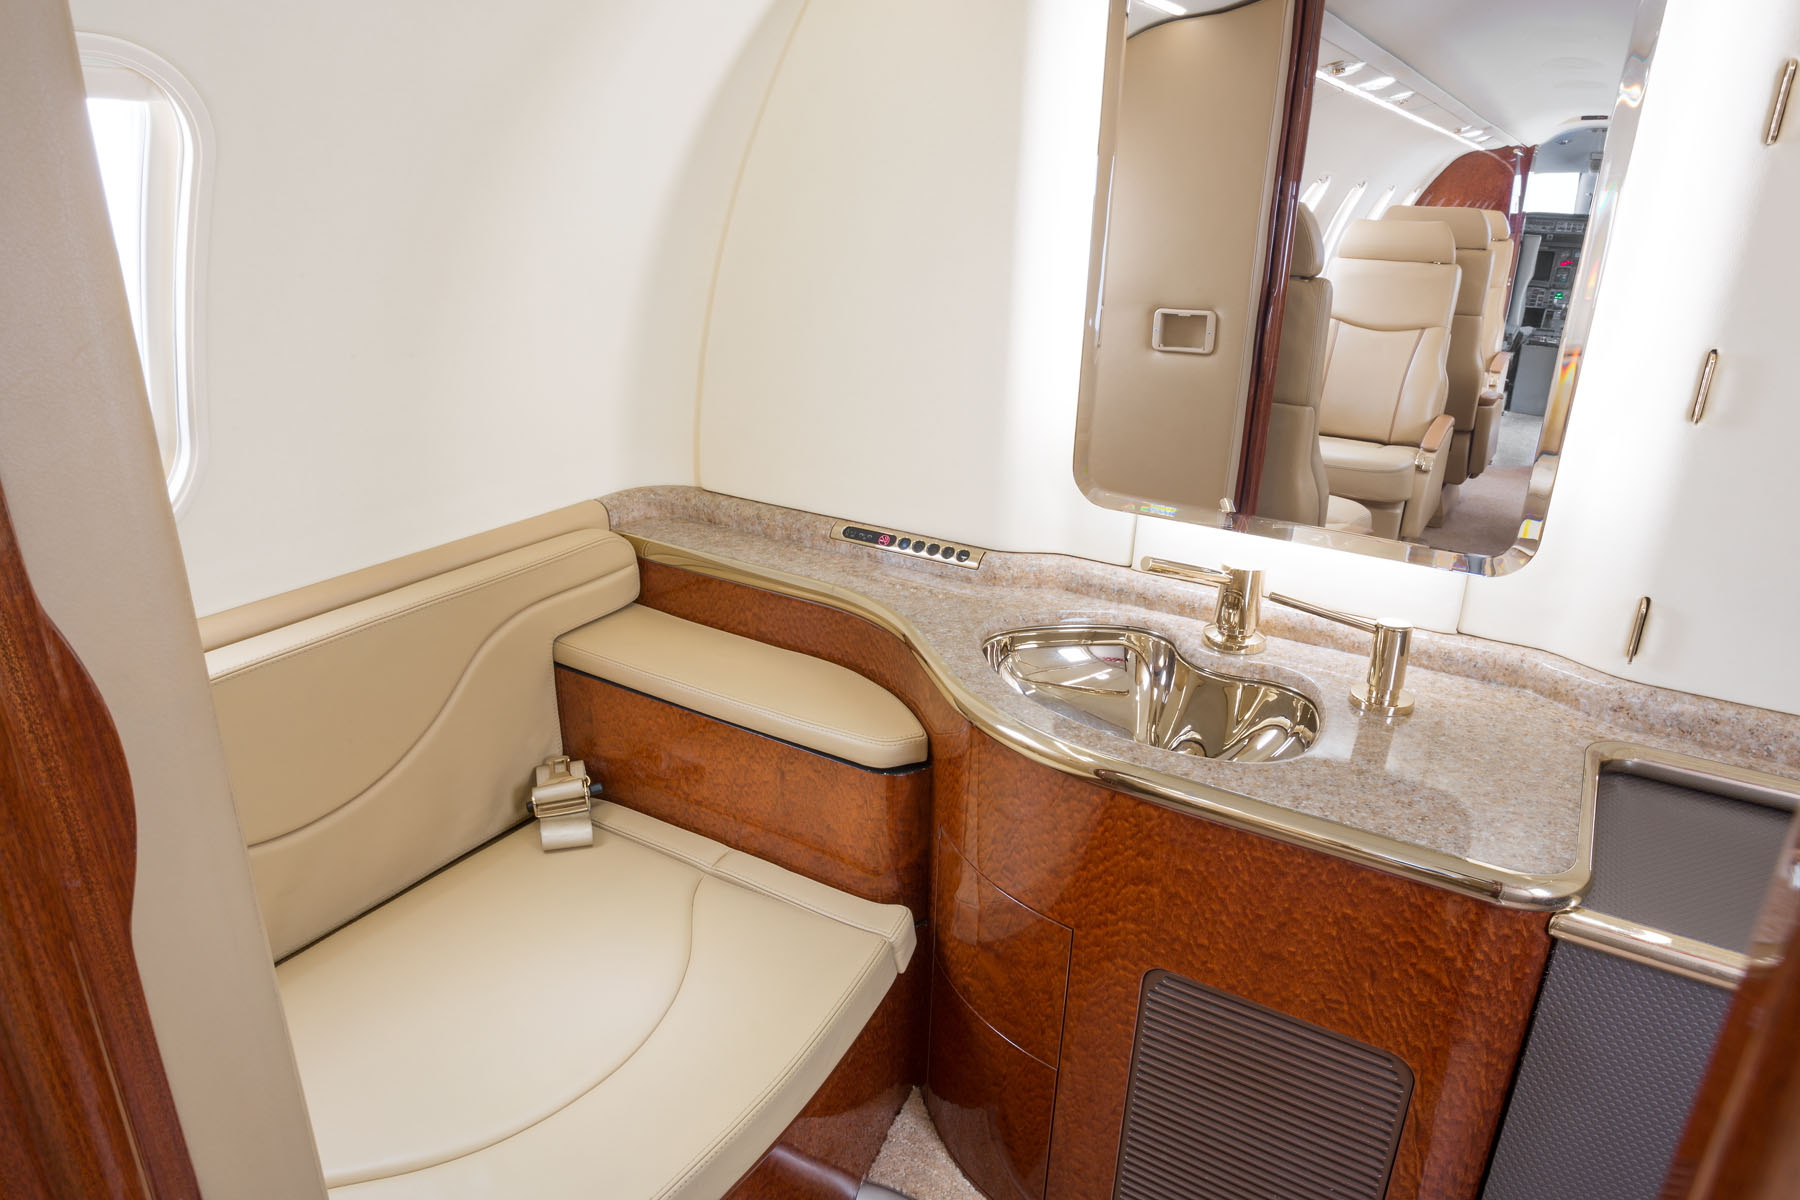 Lear-45-Interior4_light-Jet_Legacy_Aviation_Private_Jet_NetJets_Jet_Charter_TEB_VNY_MIA_PBI_FRG_SFO_FLL_FXE_BED.jpg.jpg